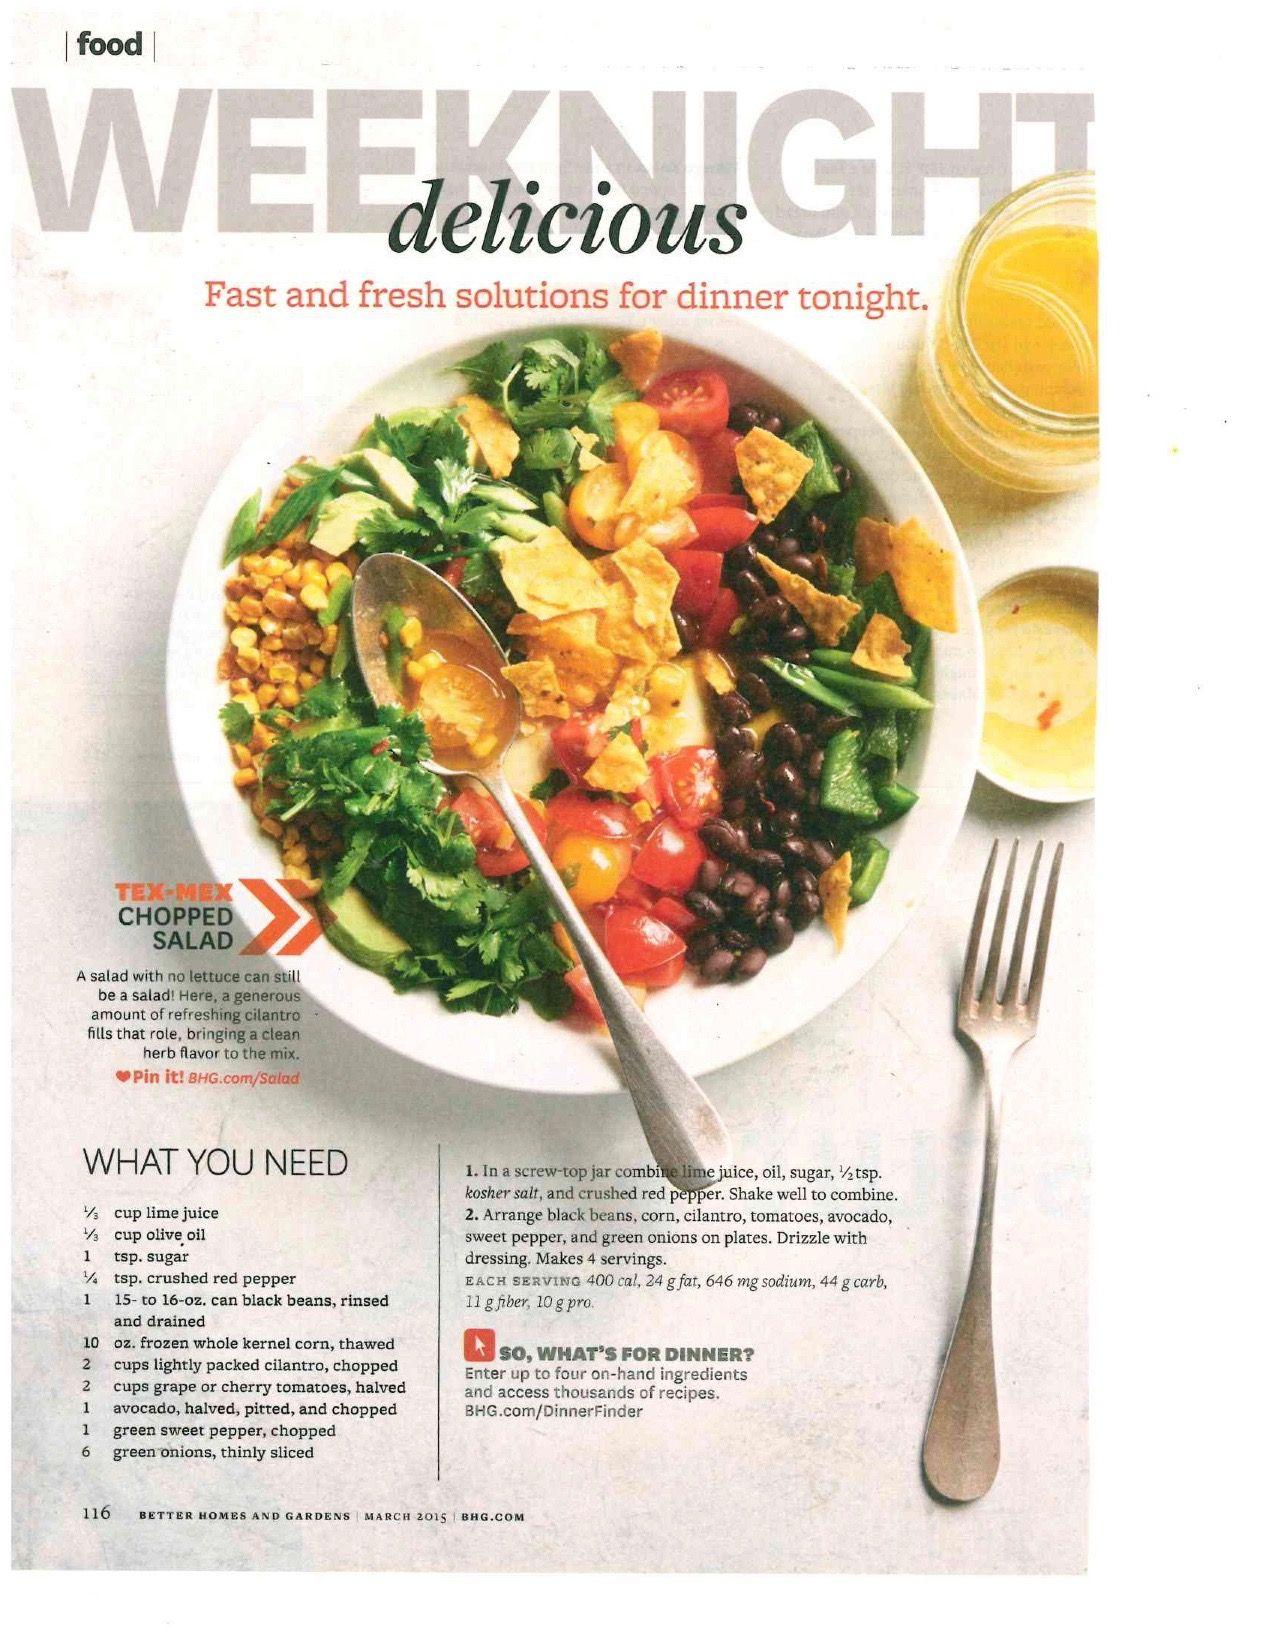 March 2015 Recipes >> Tex Mex Chopped Salad Bh G March 2015 Recipes Sandwiches